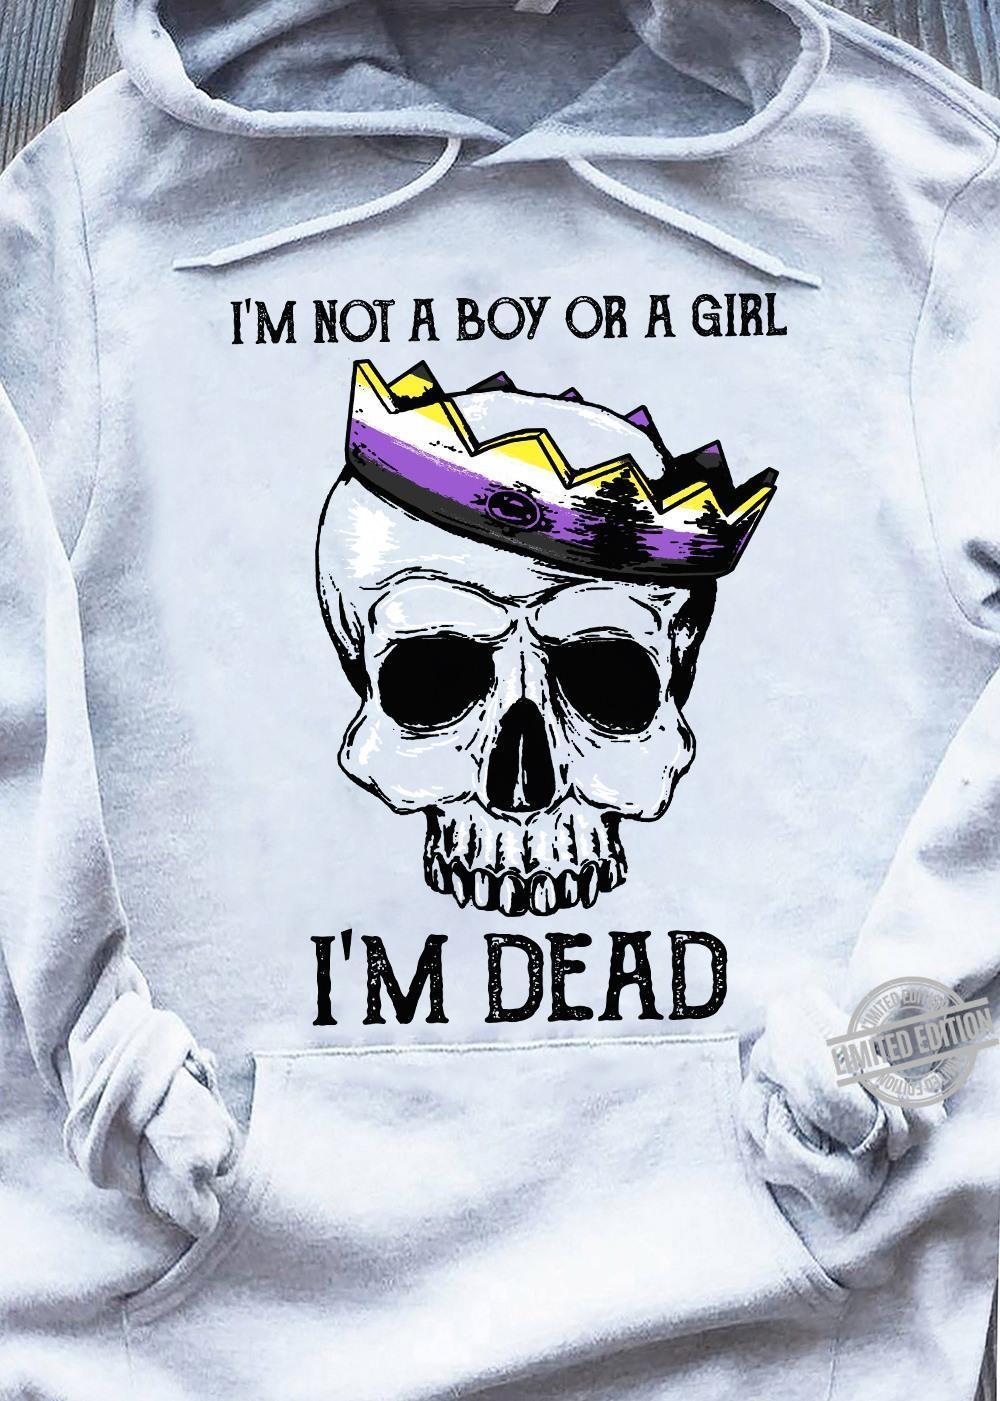 I'm Not A Boy Or A Girl I'm Dead Shirt